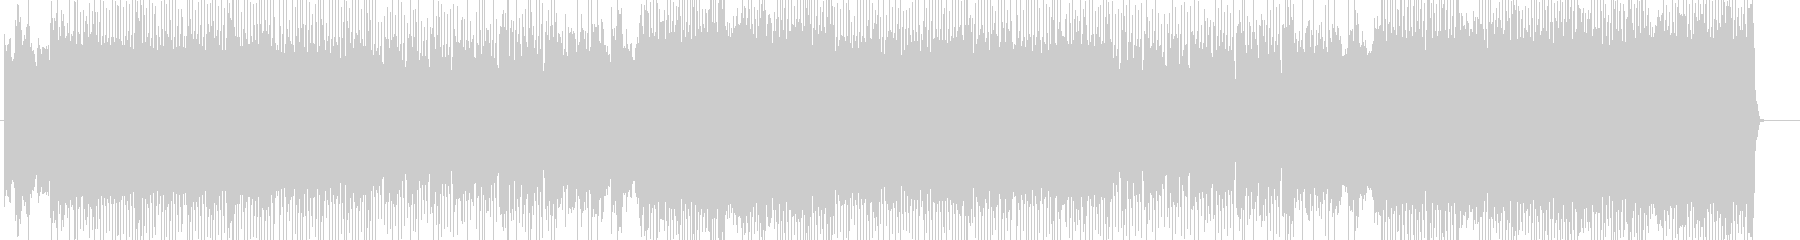 「HR/HM」「ROCK」BGM101の未再生の波形